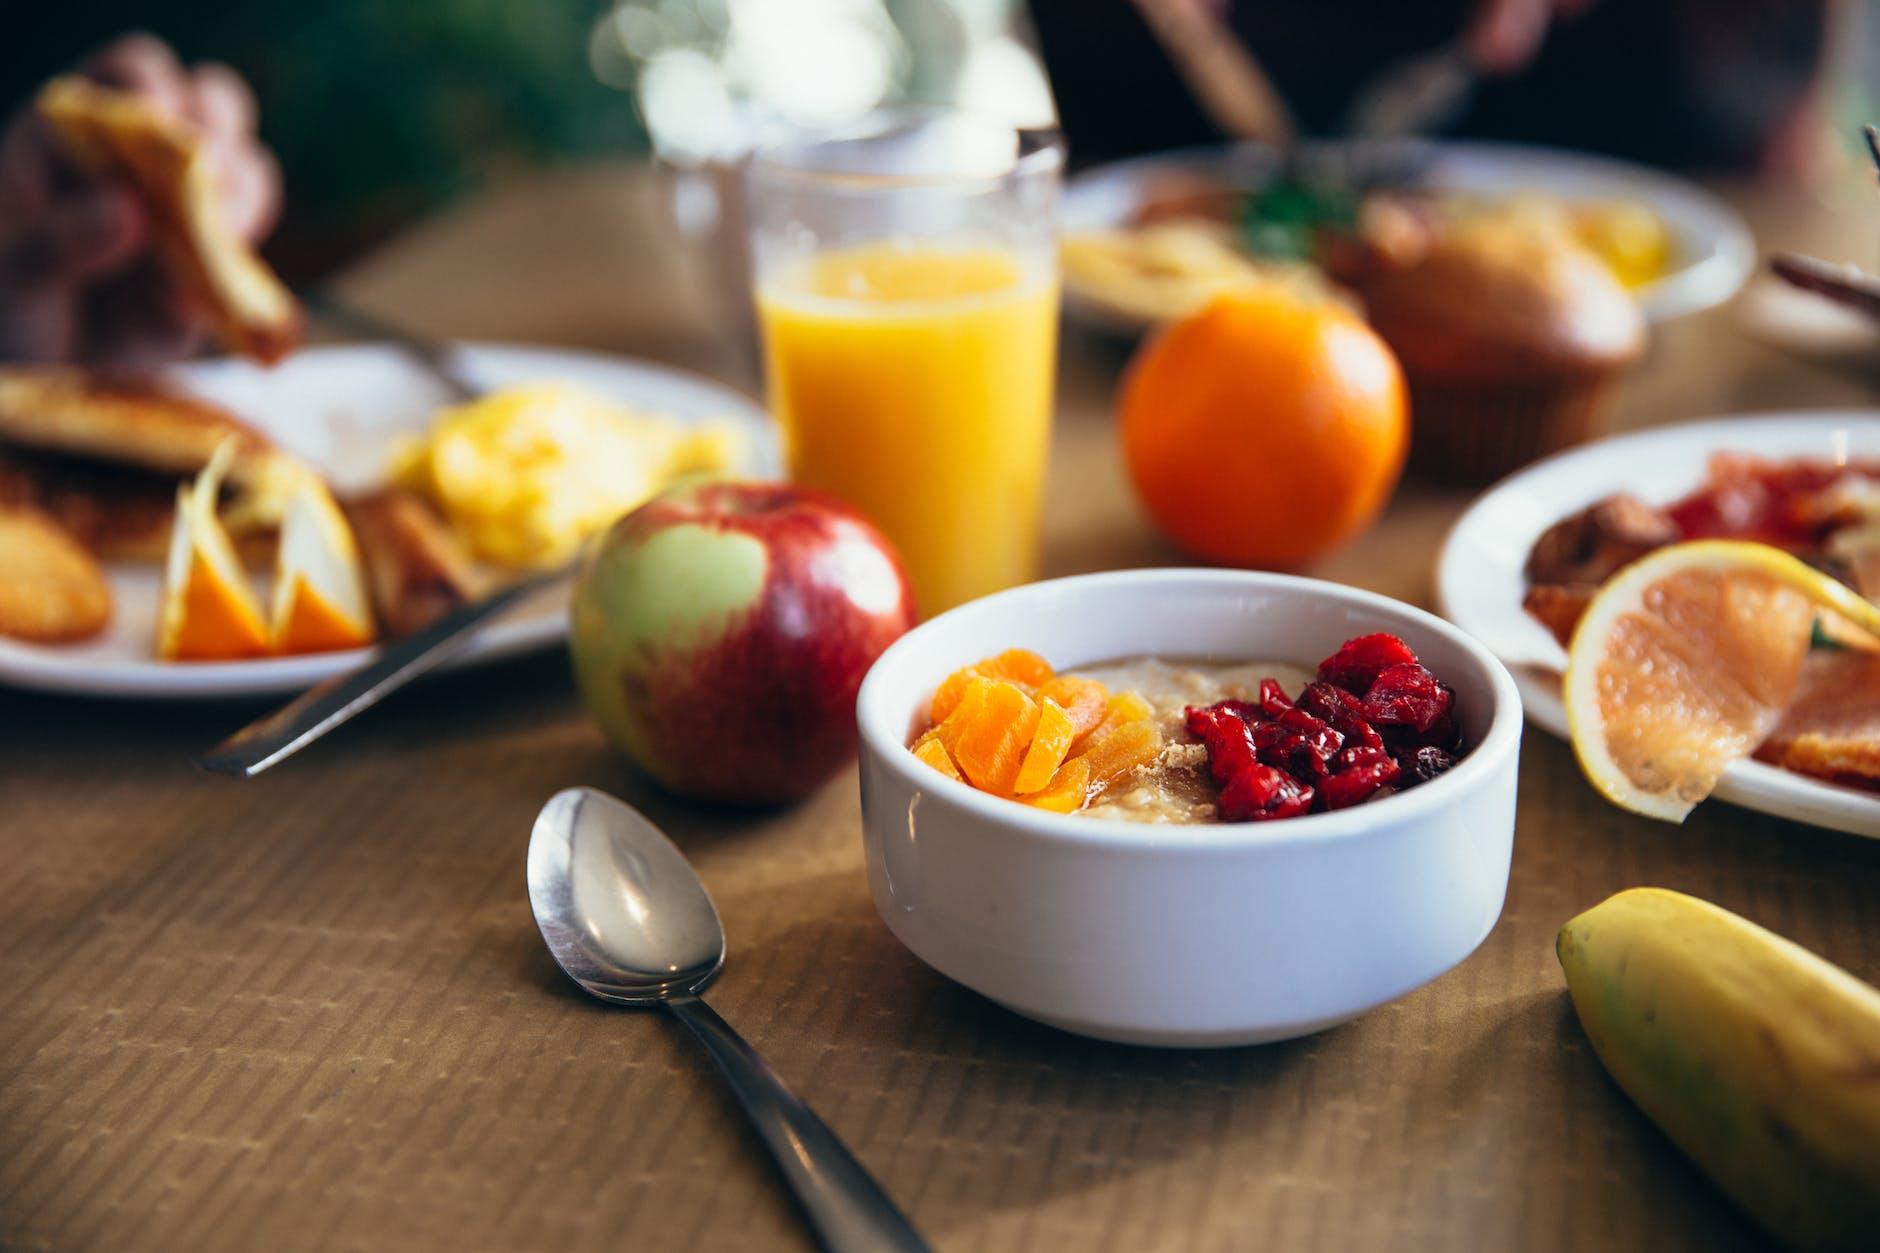 Ontbijt - Glas met jus d'orange en appels